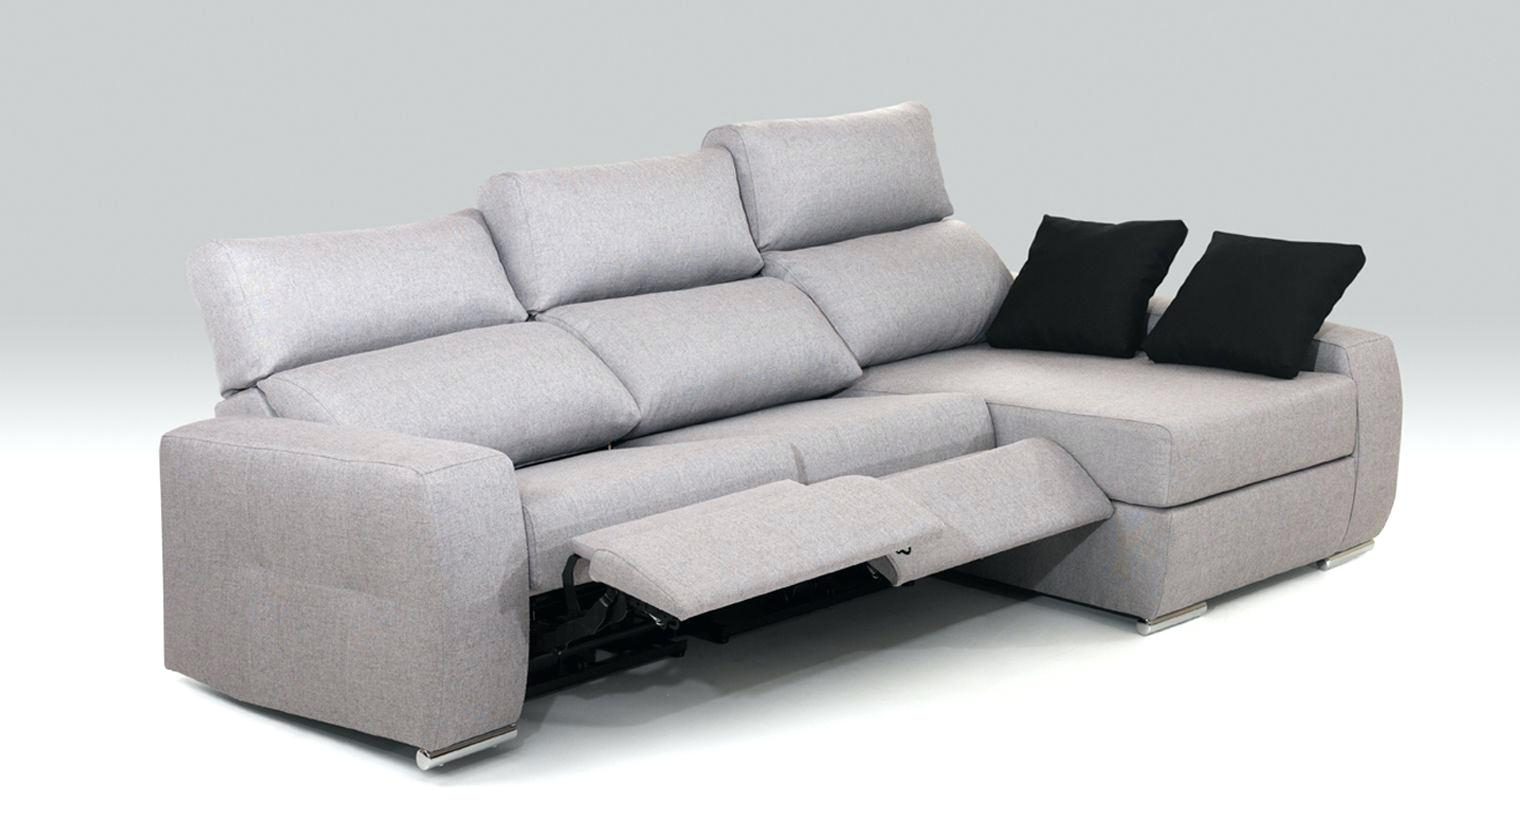 Sofas Relax El Corte Ingles Dddy sofa Relax El Corte Ingles Mit Relaxfunktion Gunstig